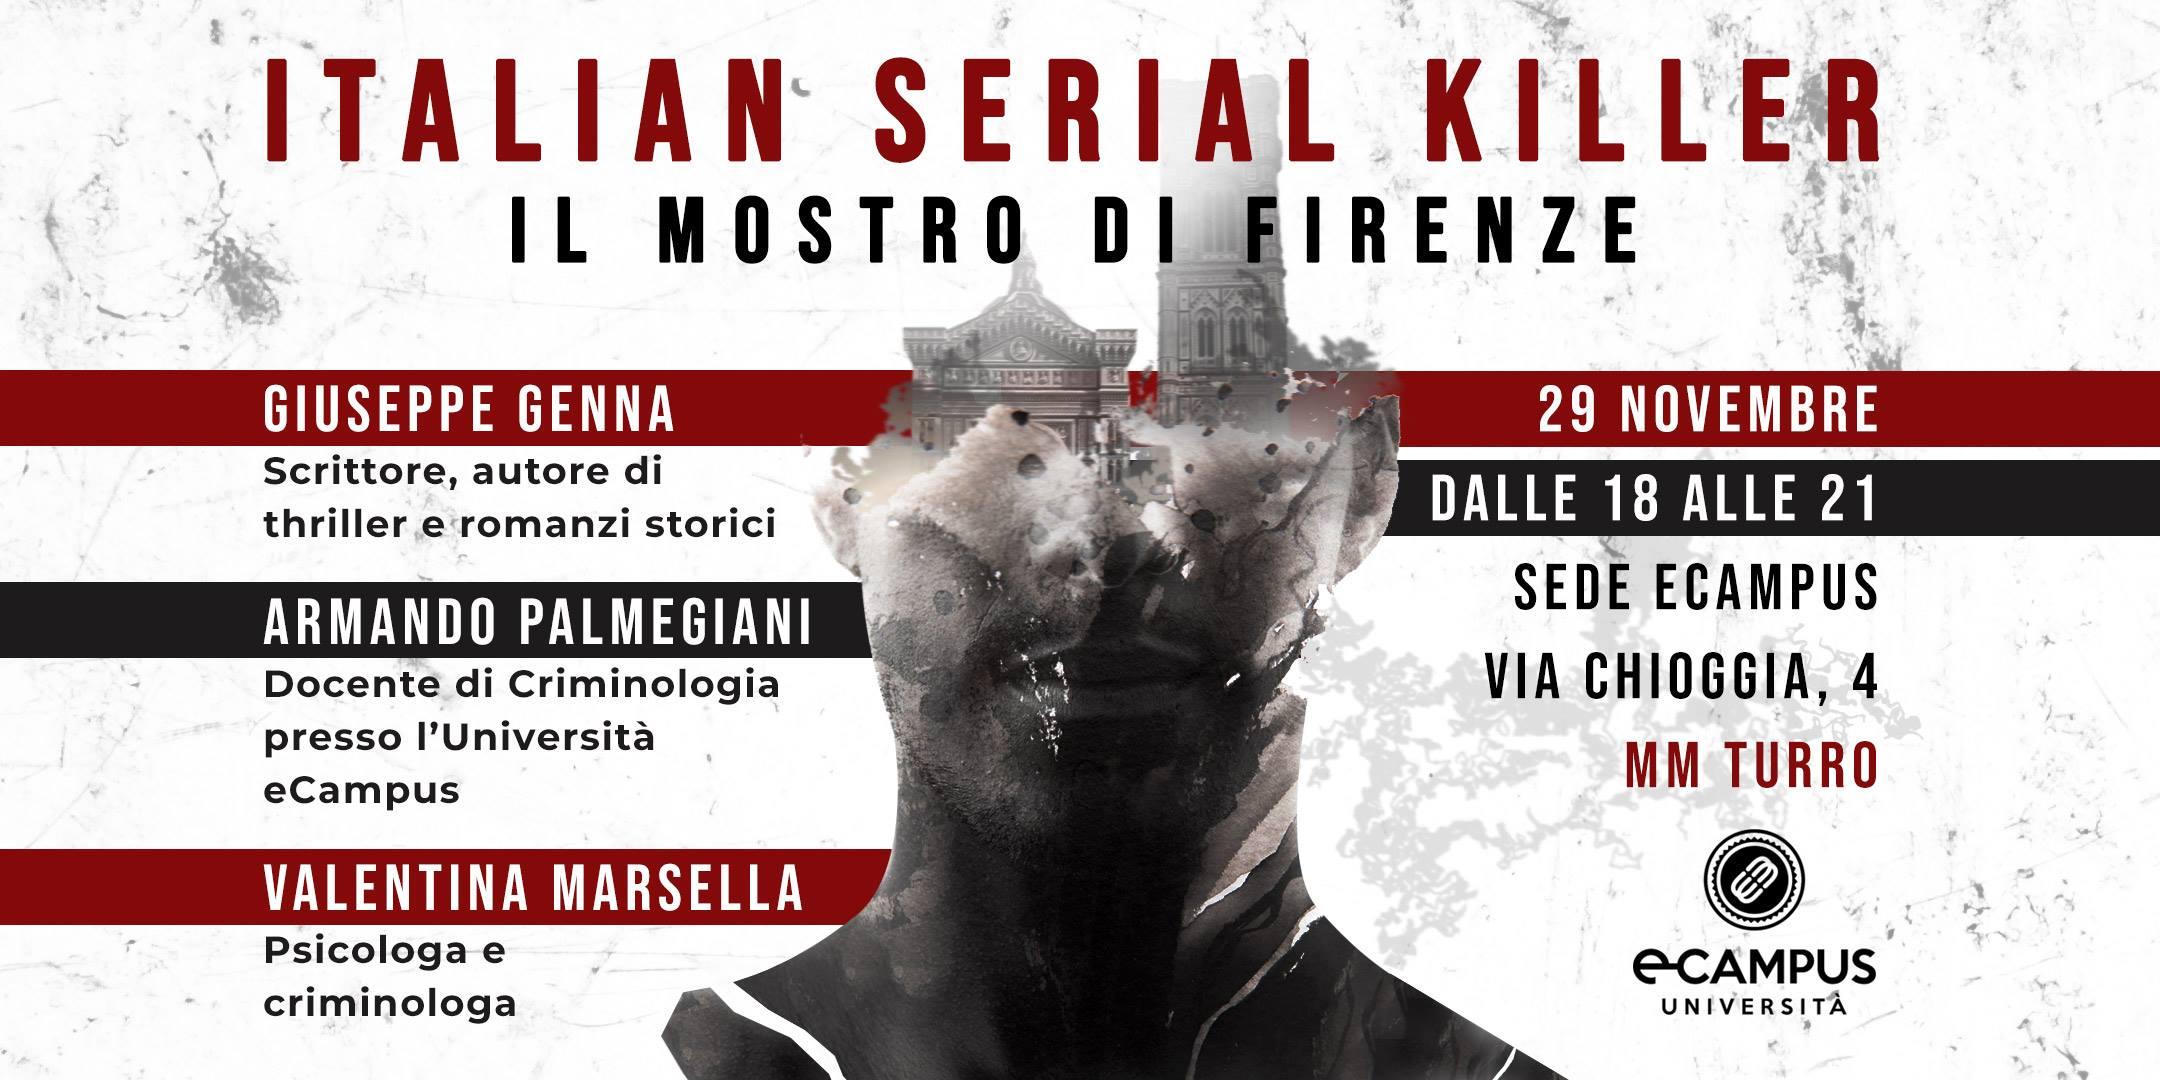 italian-serial-killer-locandina